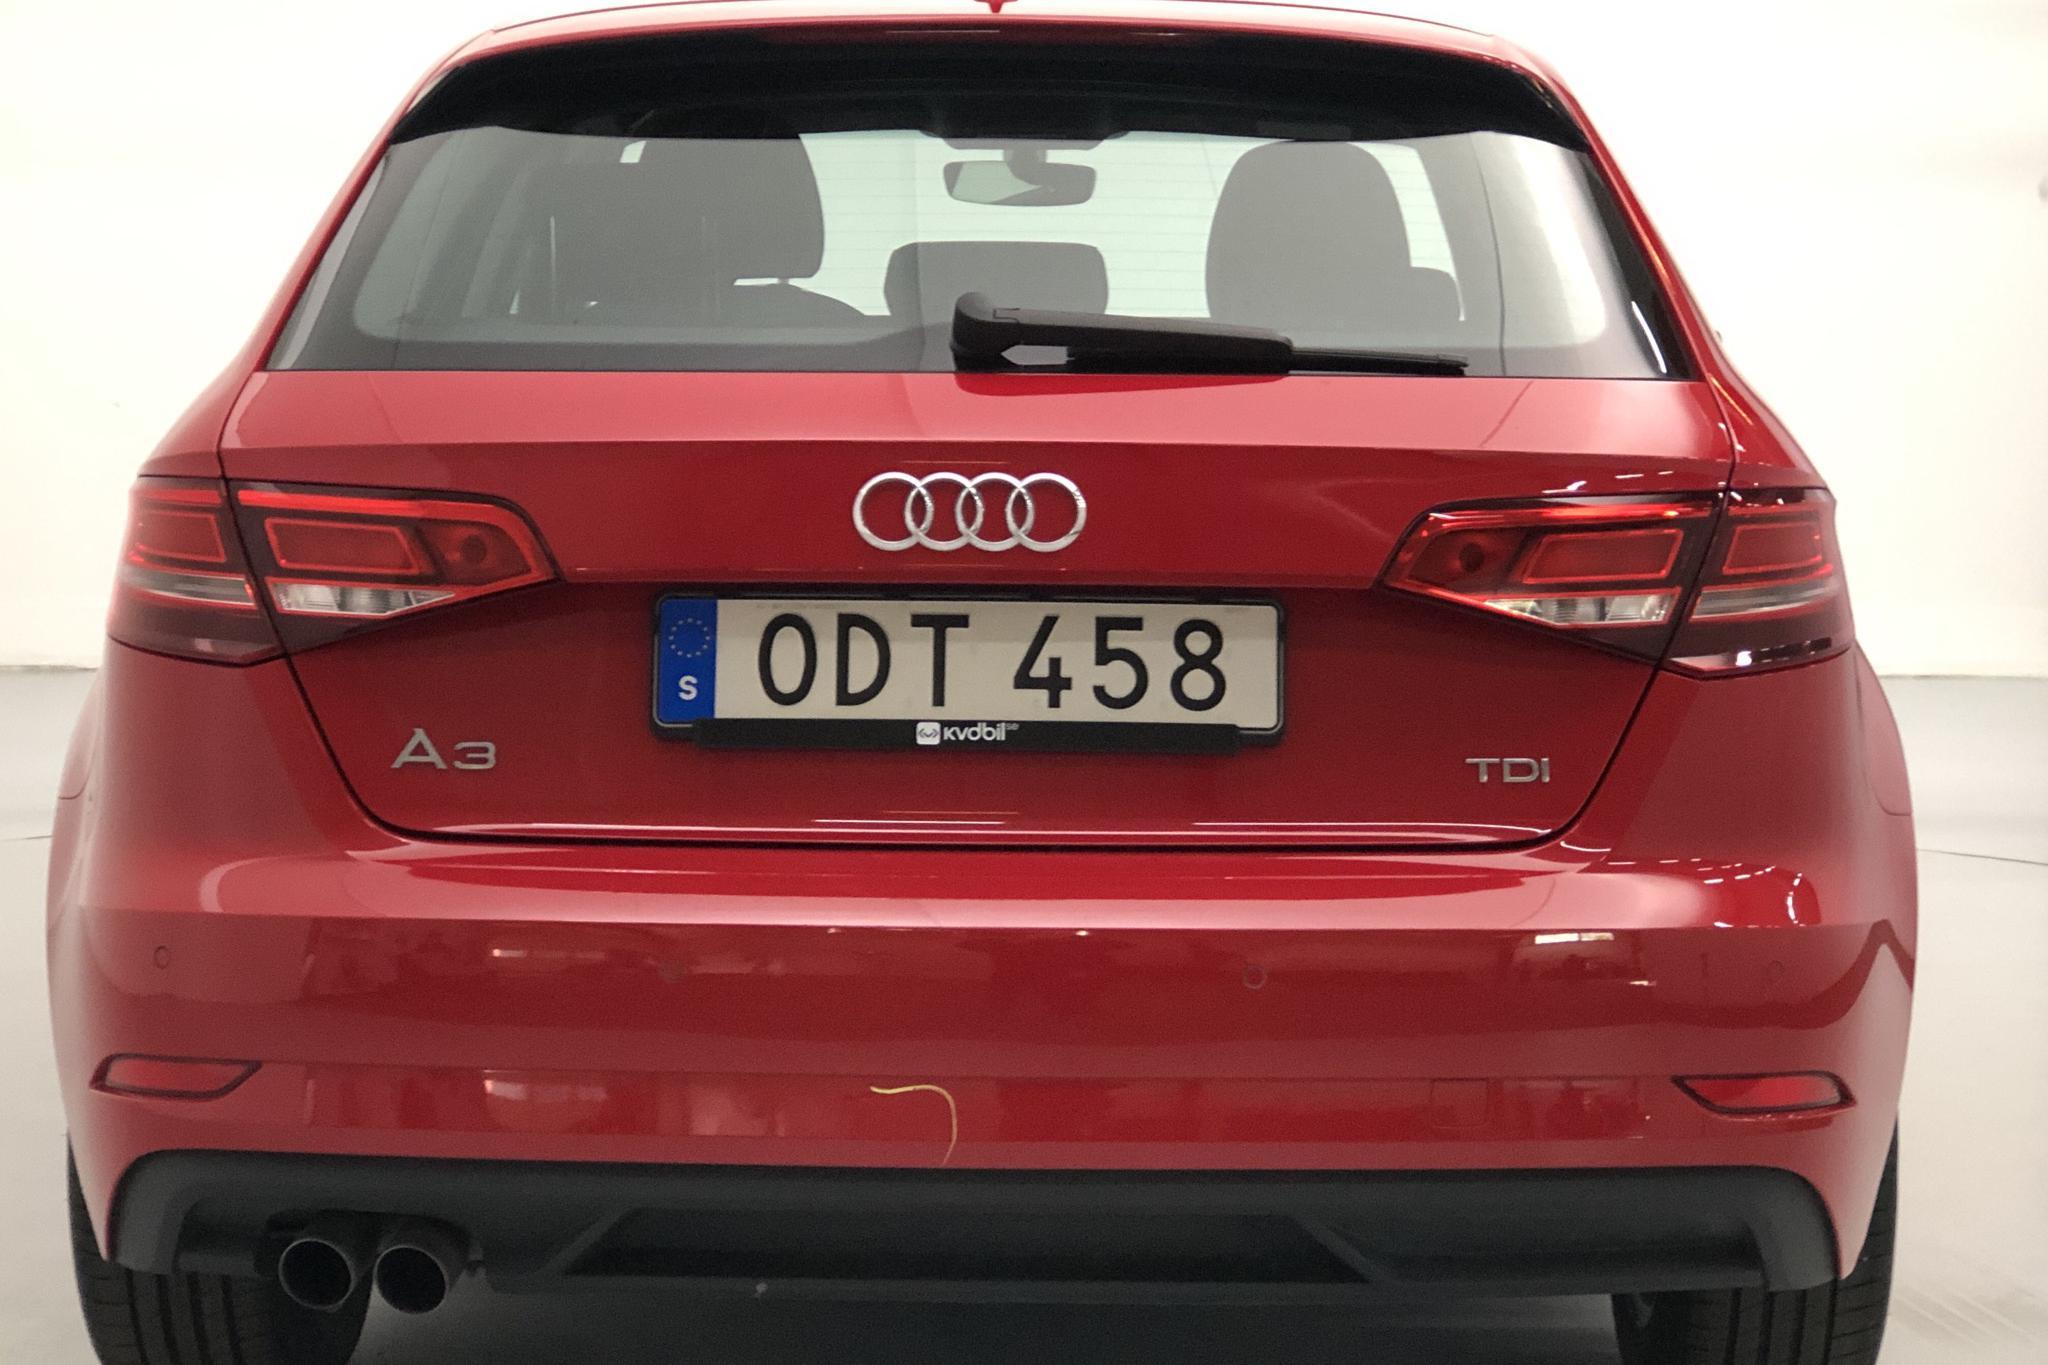 Audi A3 2.0 TDI Sportback (150hk) - 46 540 km - Automatic - red - 2017